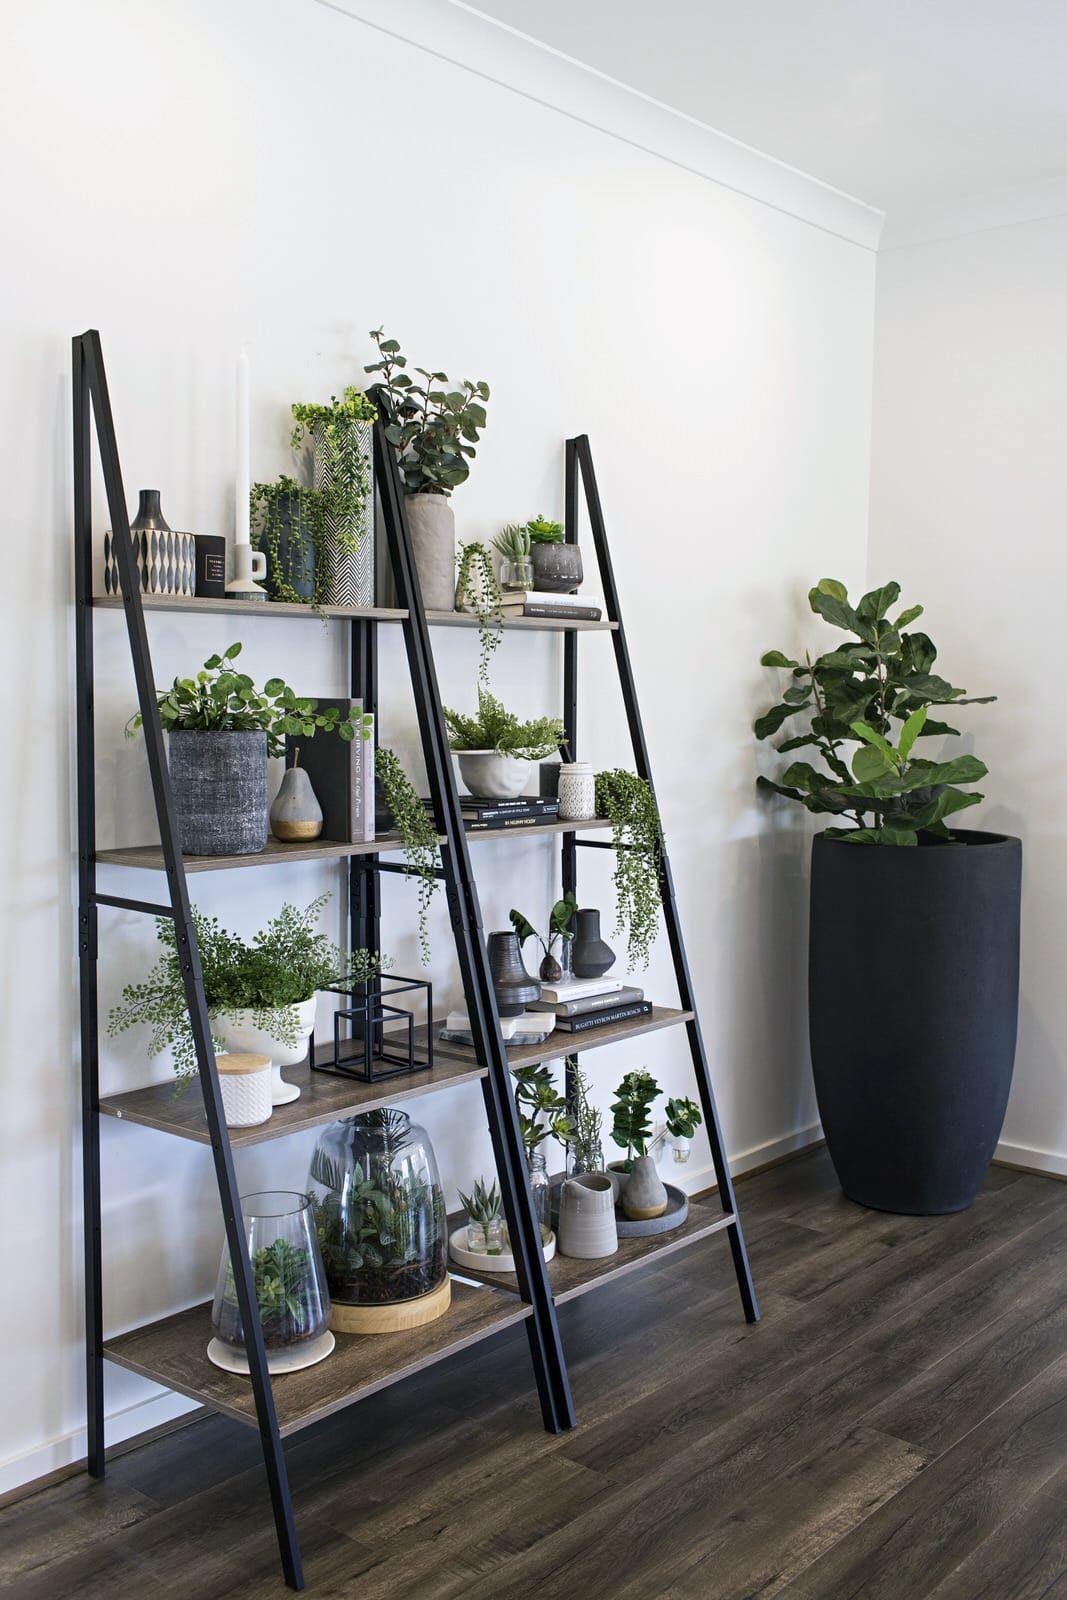 Kmart Hack Industrial Shelf Turned Vertical Garden